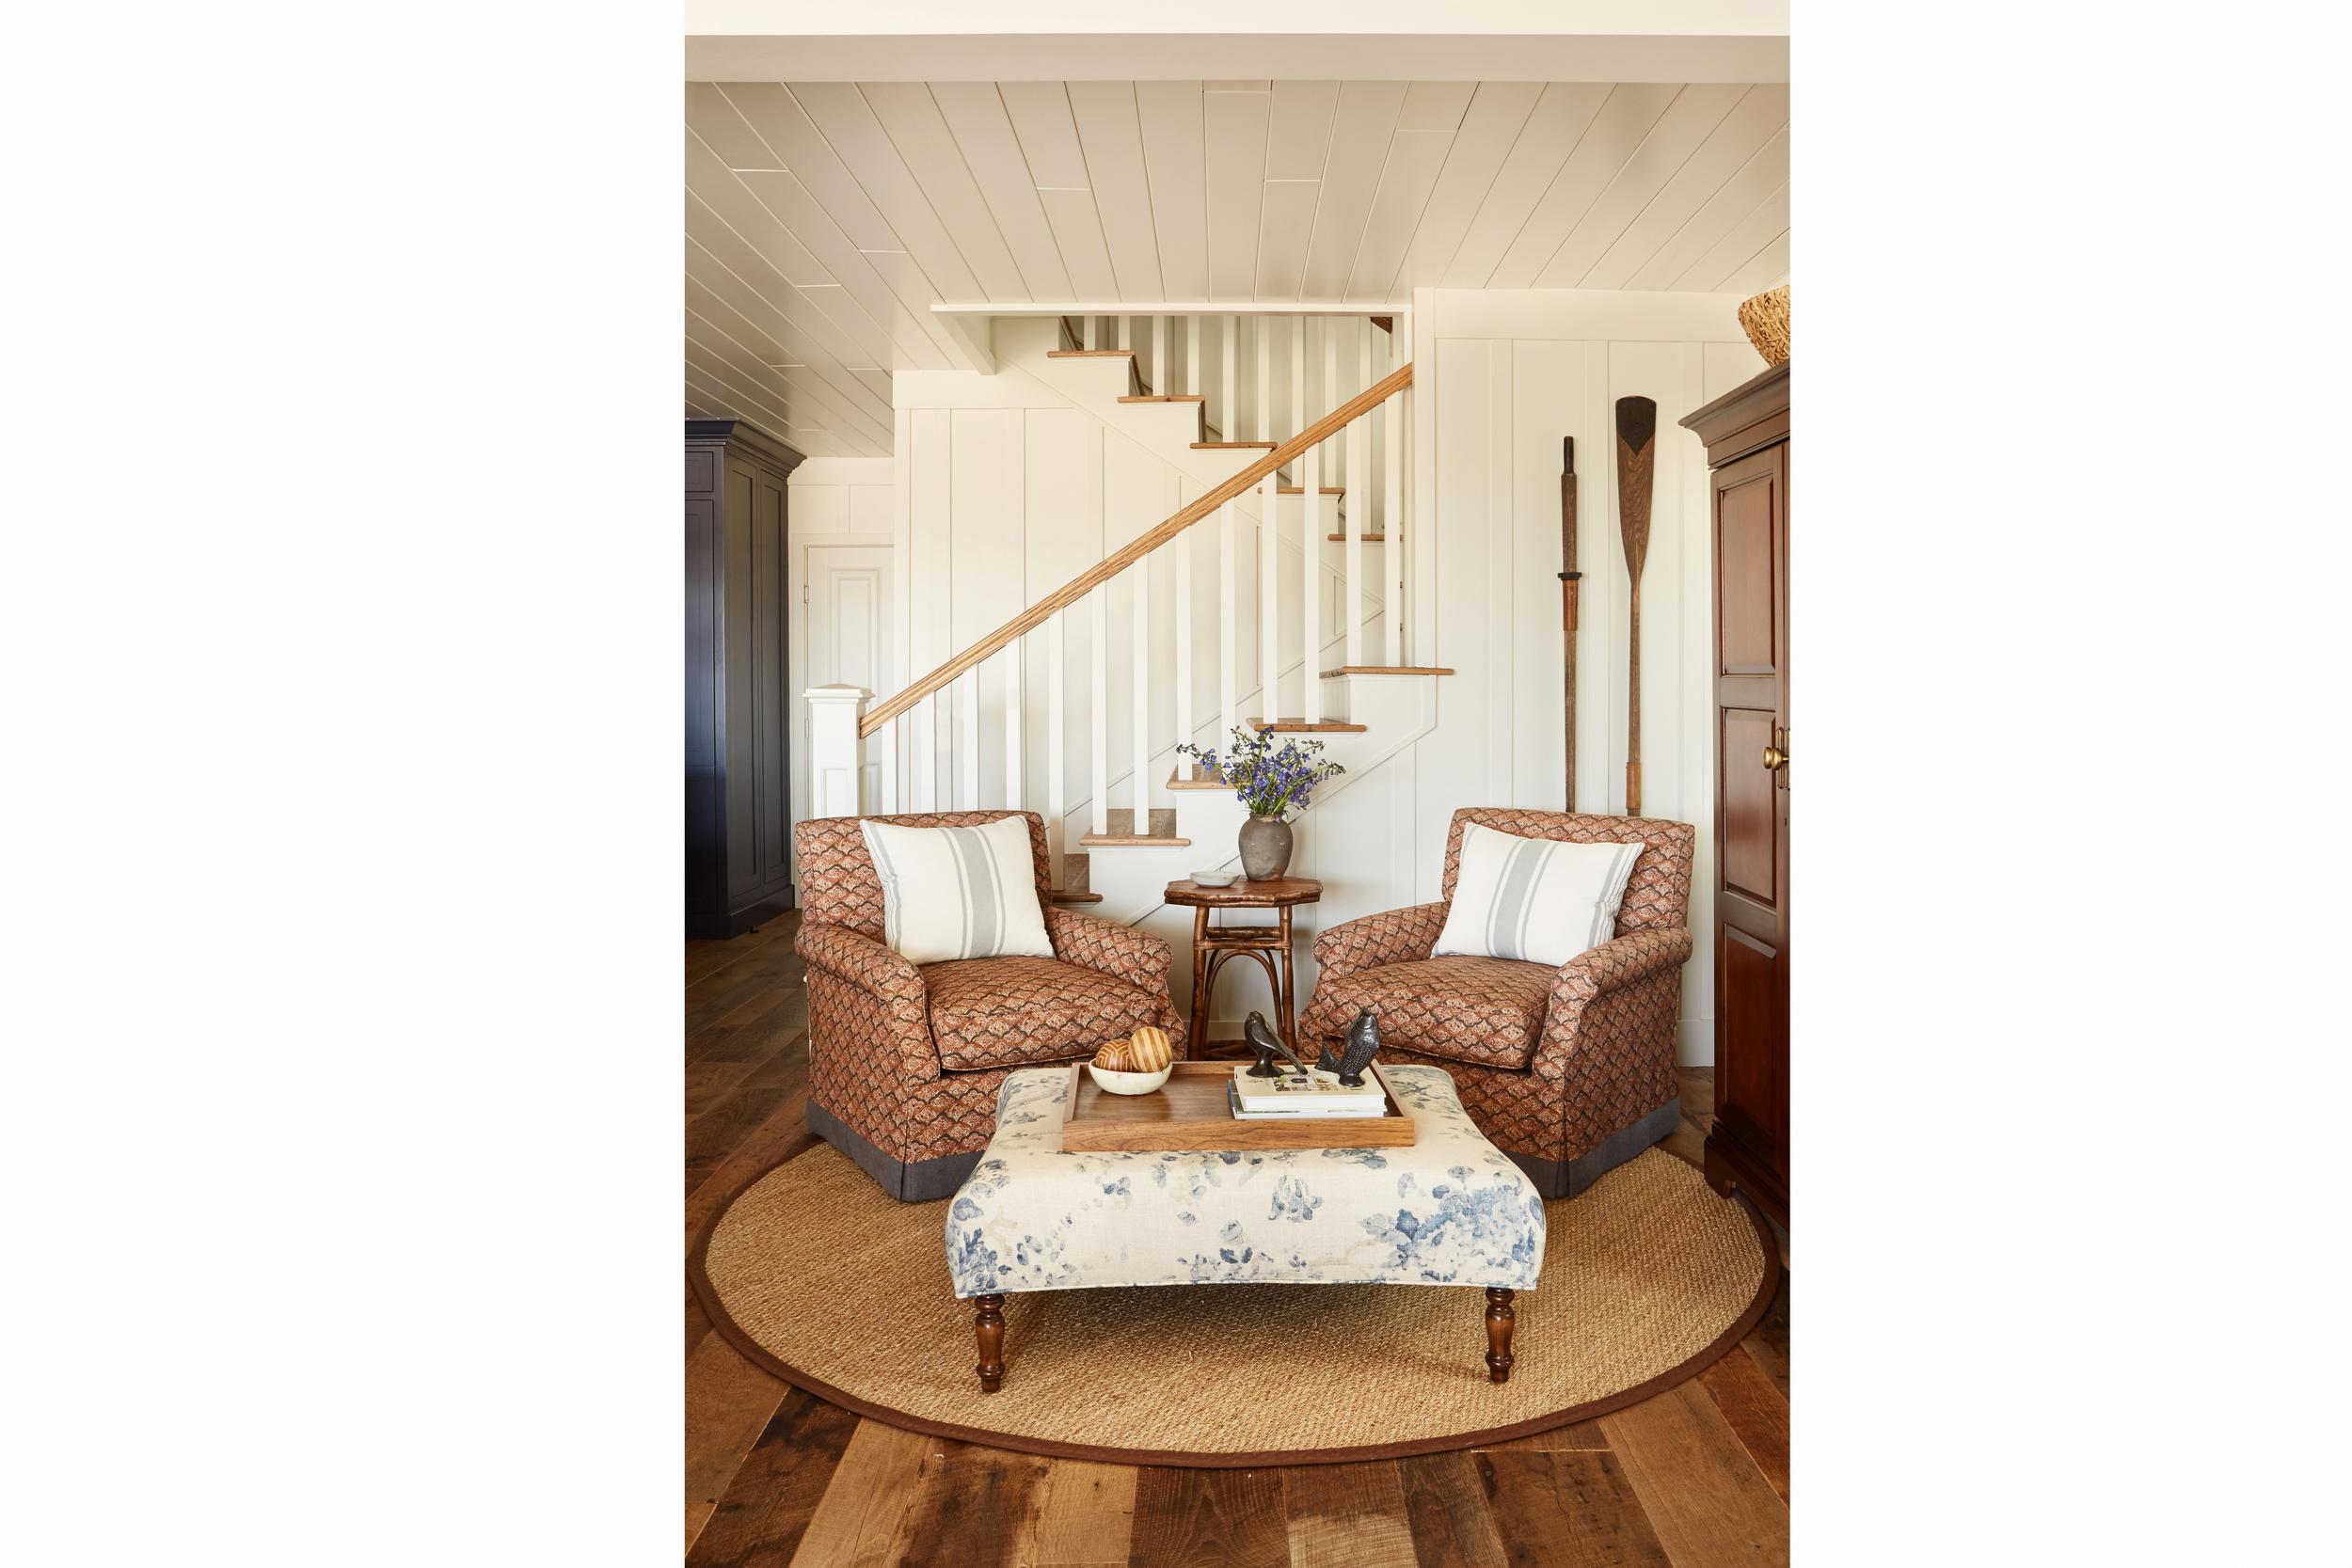 newport beach interior designer brittany stiles blue kitchen nautical dining room farm table antique.jpg